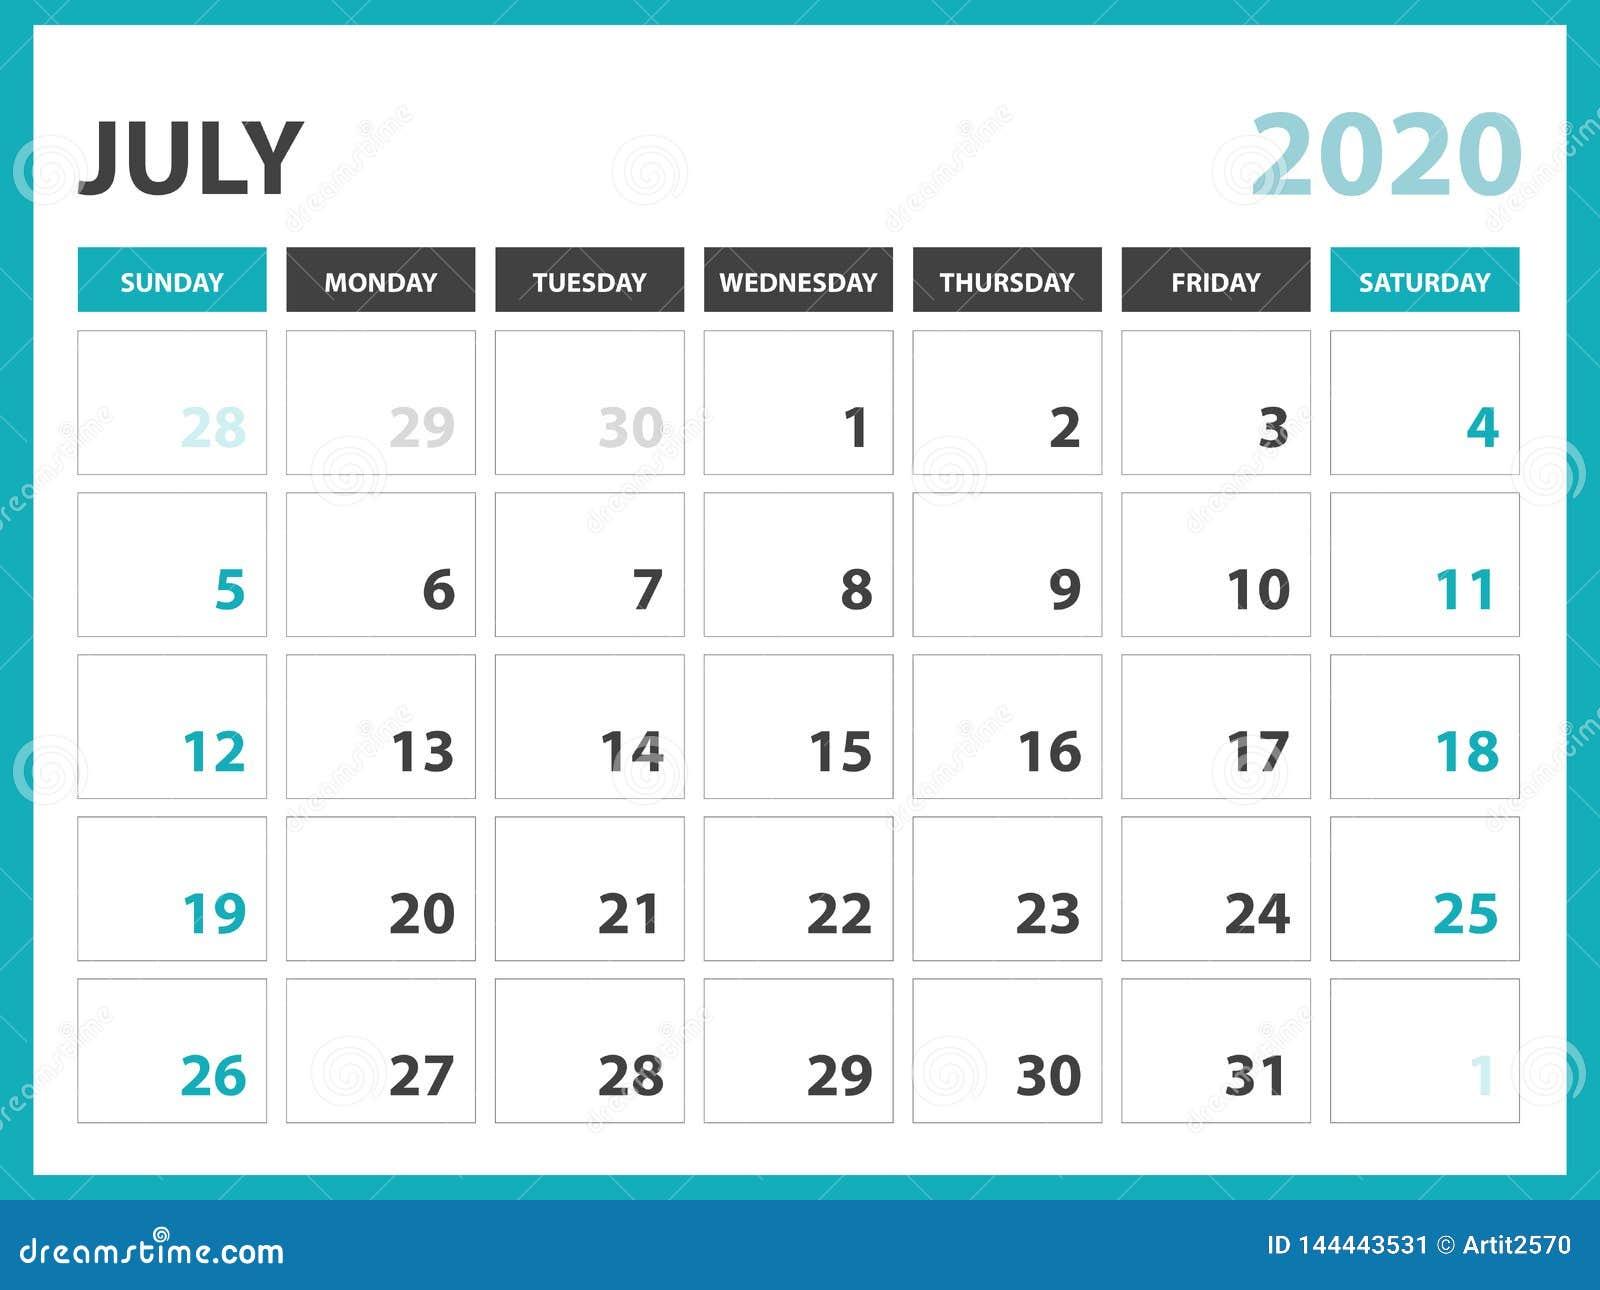 Calendar Of July 2020.Desk Calendar Layout Size 8 X 6 Inch July 2020 Calendar Template